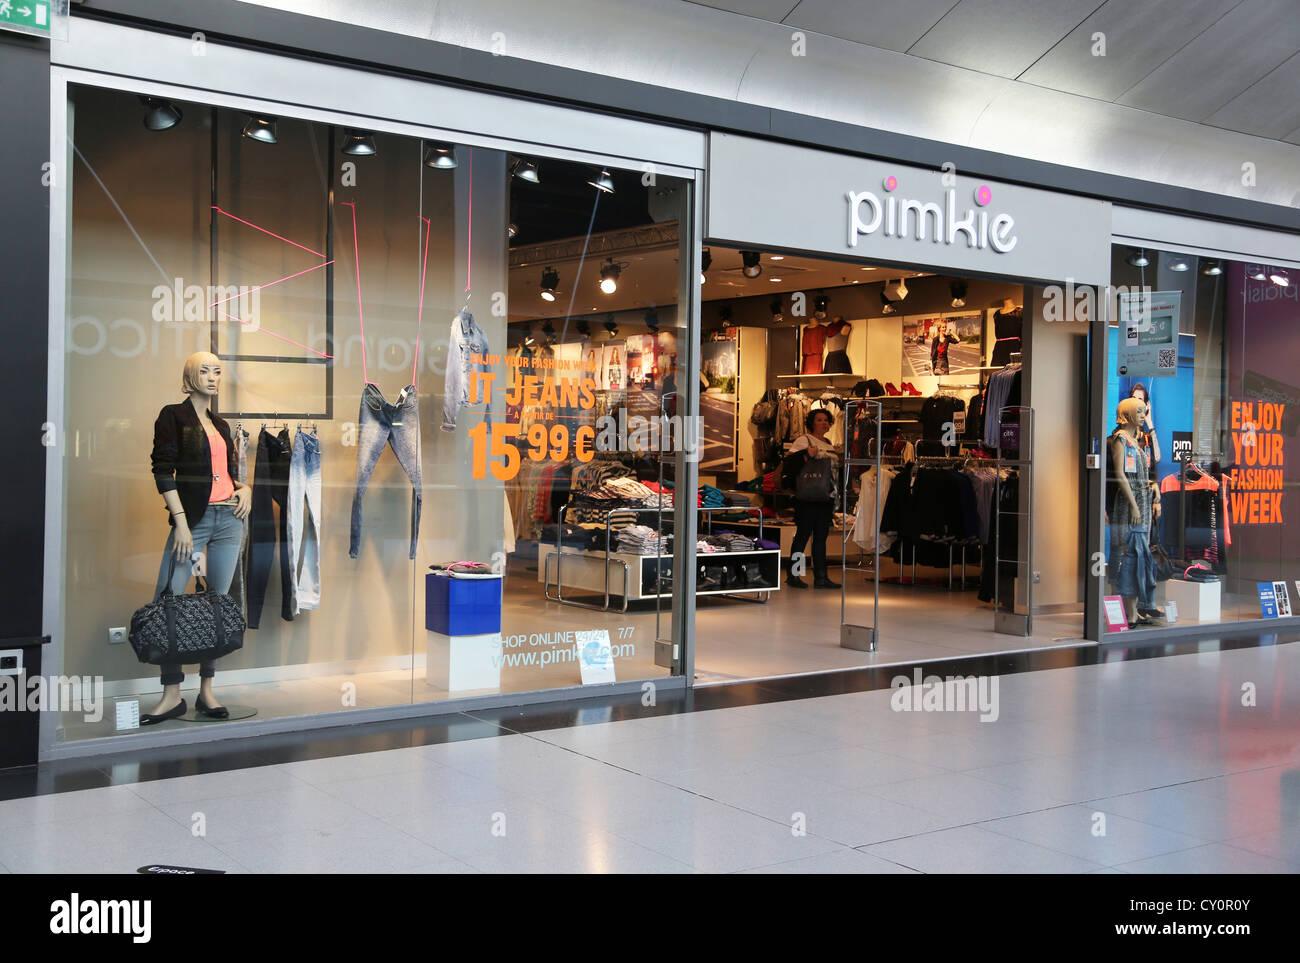 online shopping france trendy france soccer jerseys pogba griezmann payet kante mbappe football. Black Bedroom Furniture Sets. Home Design Ideas